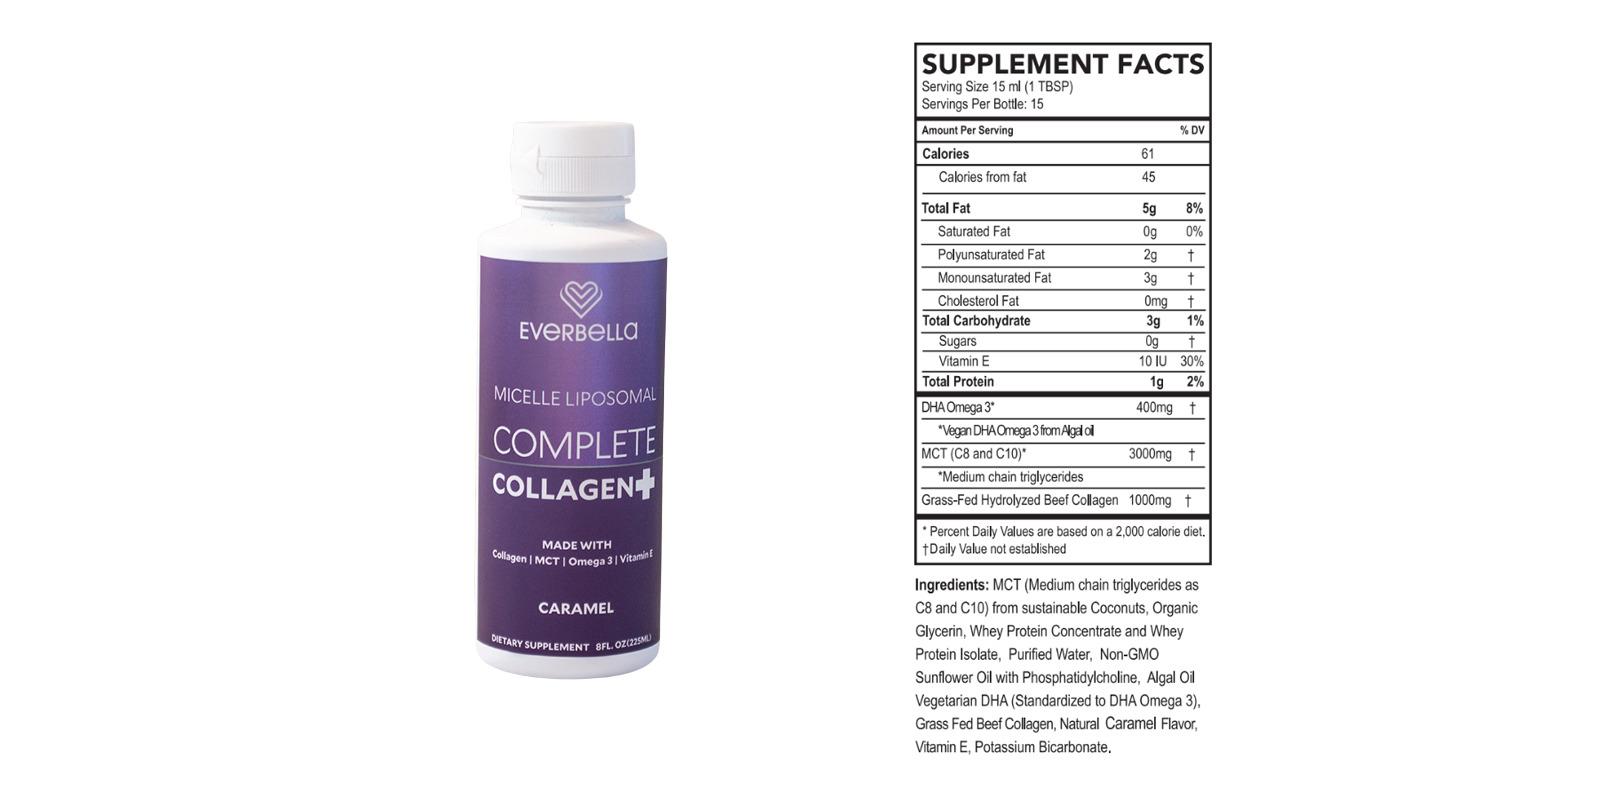 Complete Collagen Plus Ingredients Label